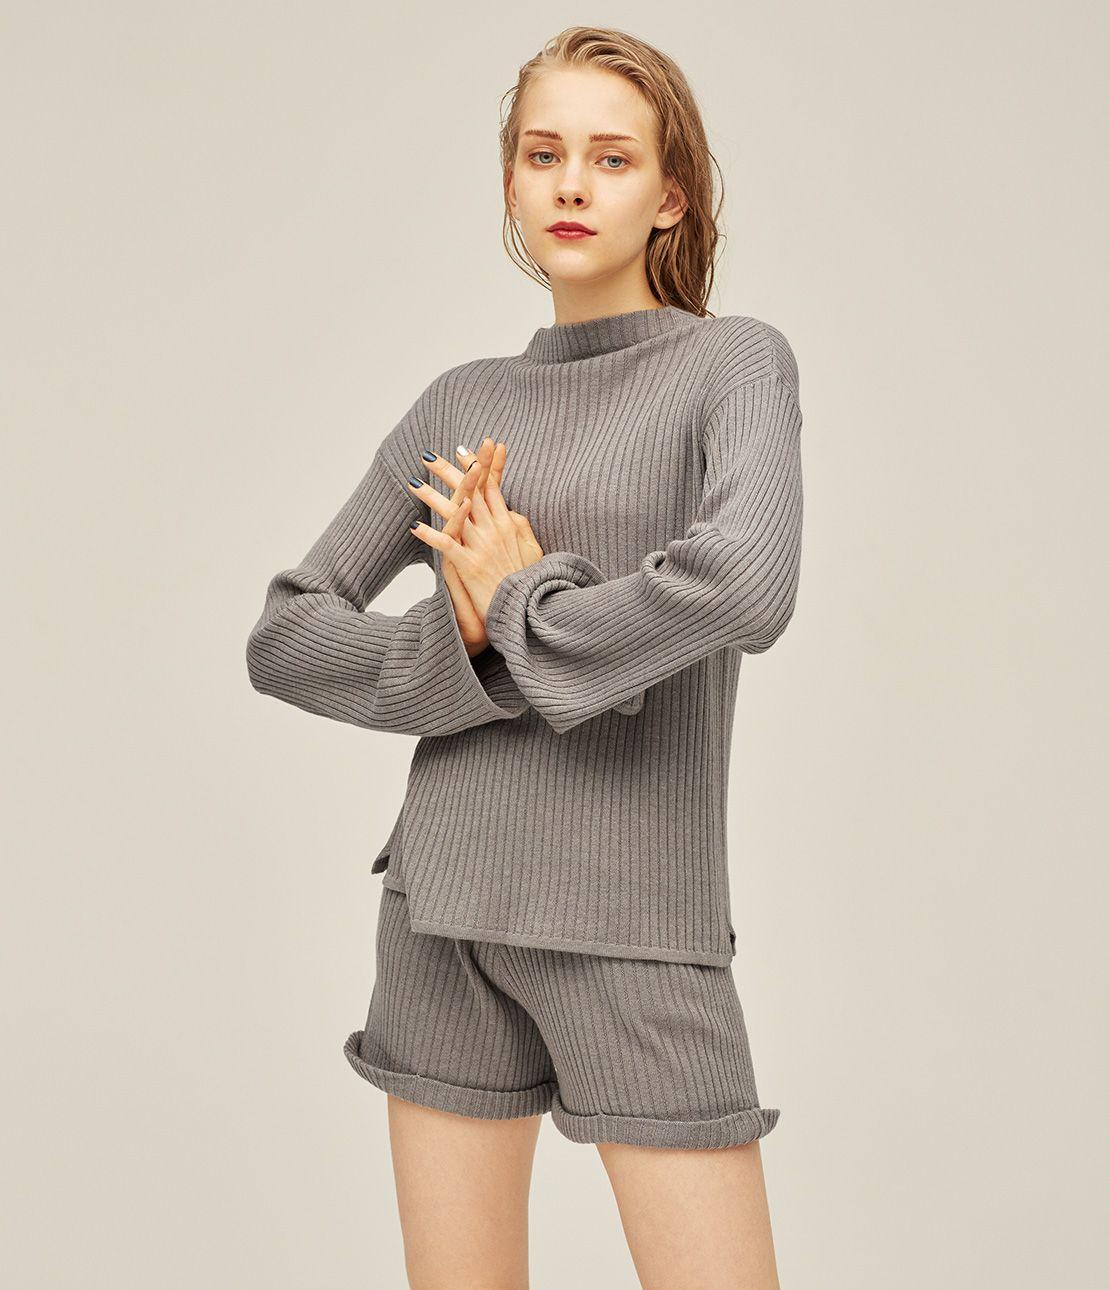 Flare sleeve knit setup